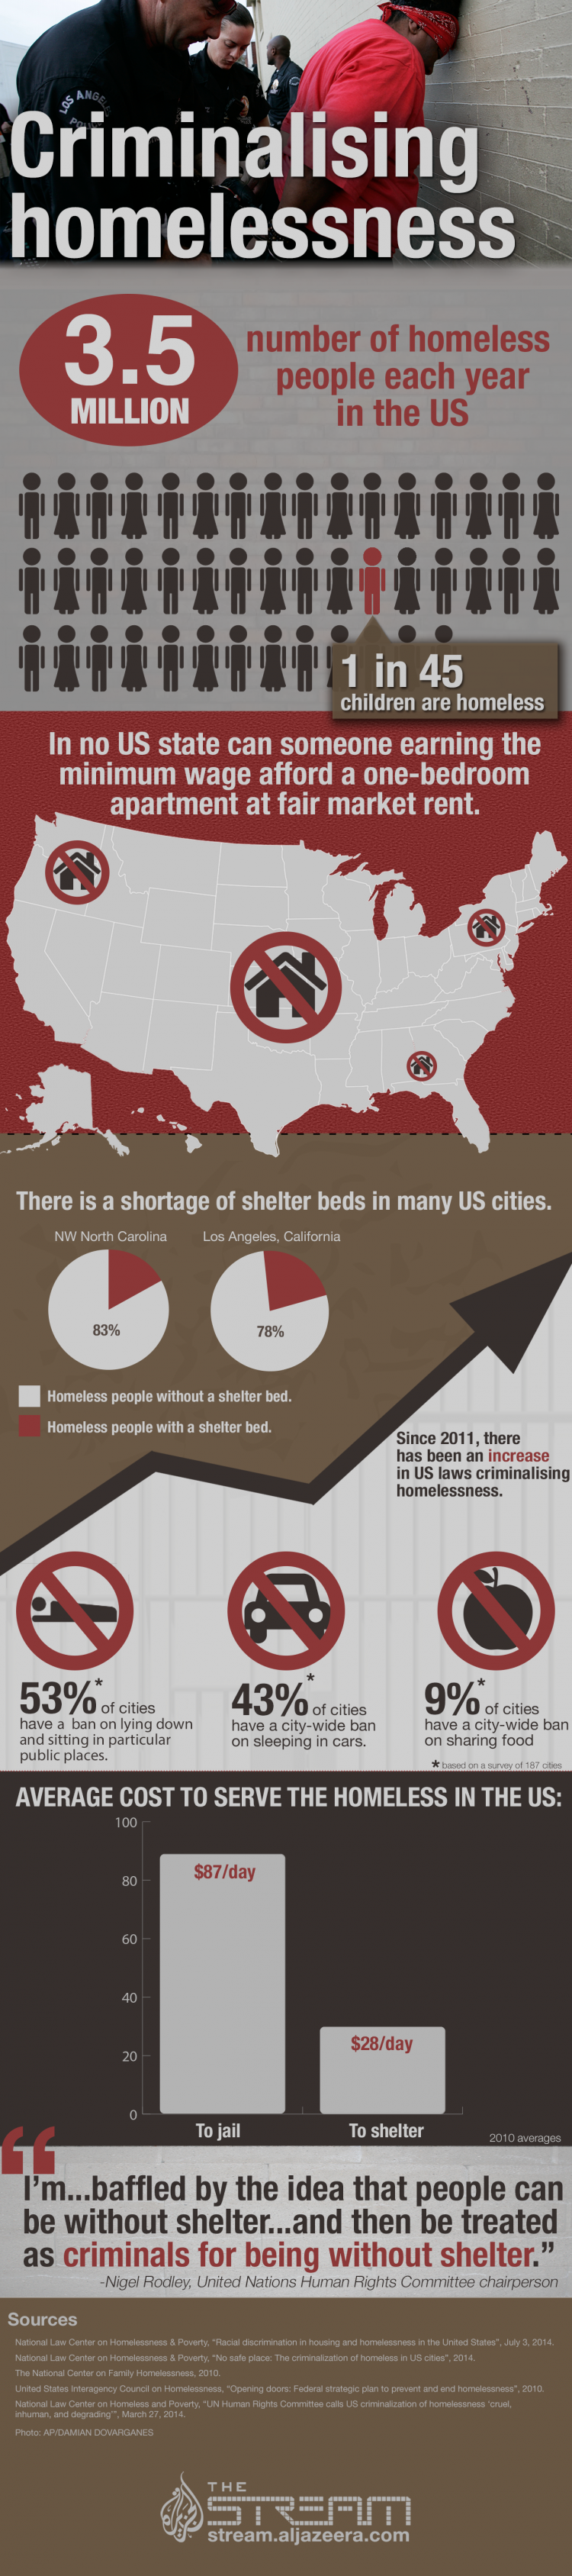 Criminalising homelessness